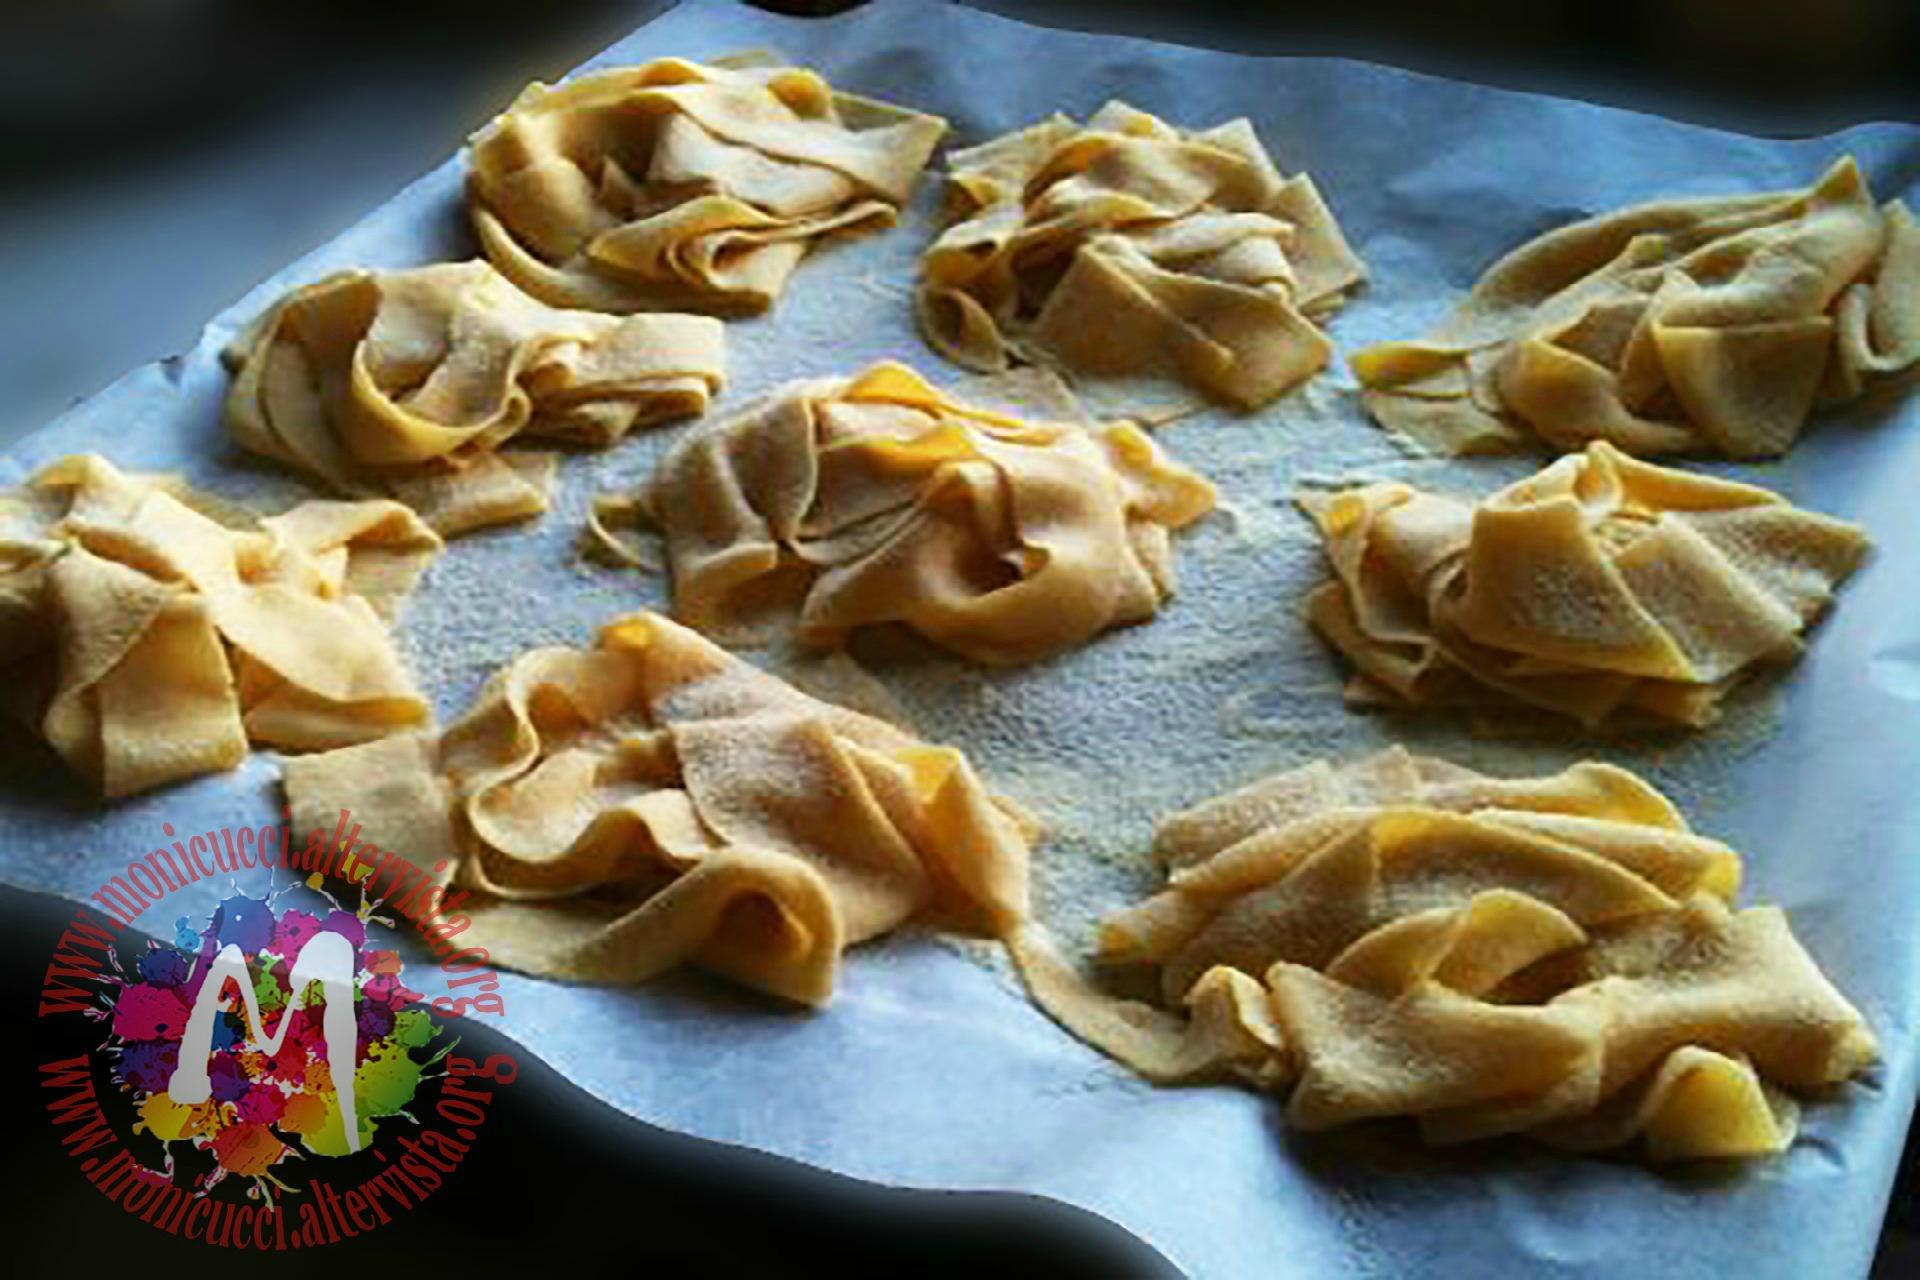 Ricetta Ravioli Kitchenaid.Pasta Fresca Con Kitchenaid Monicucci Chef